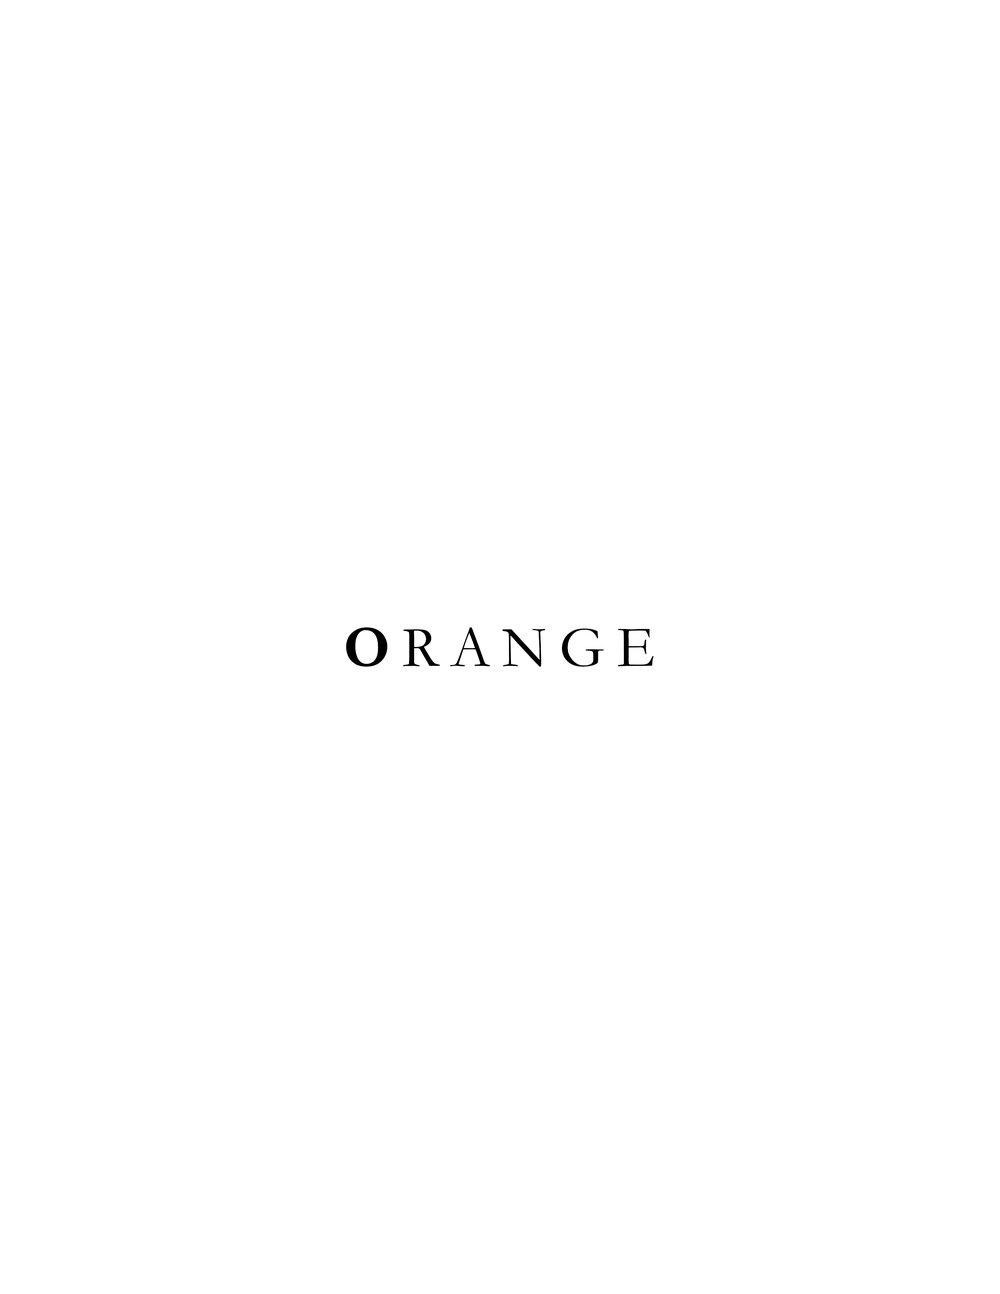 Orange TEXT.jpg